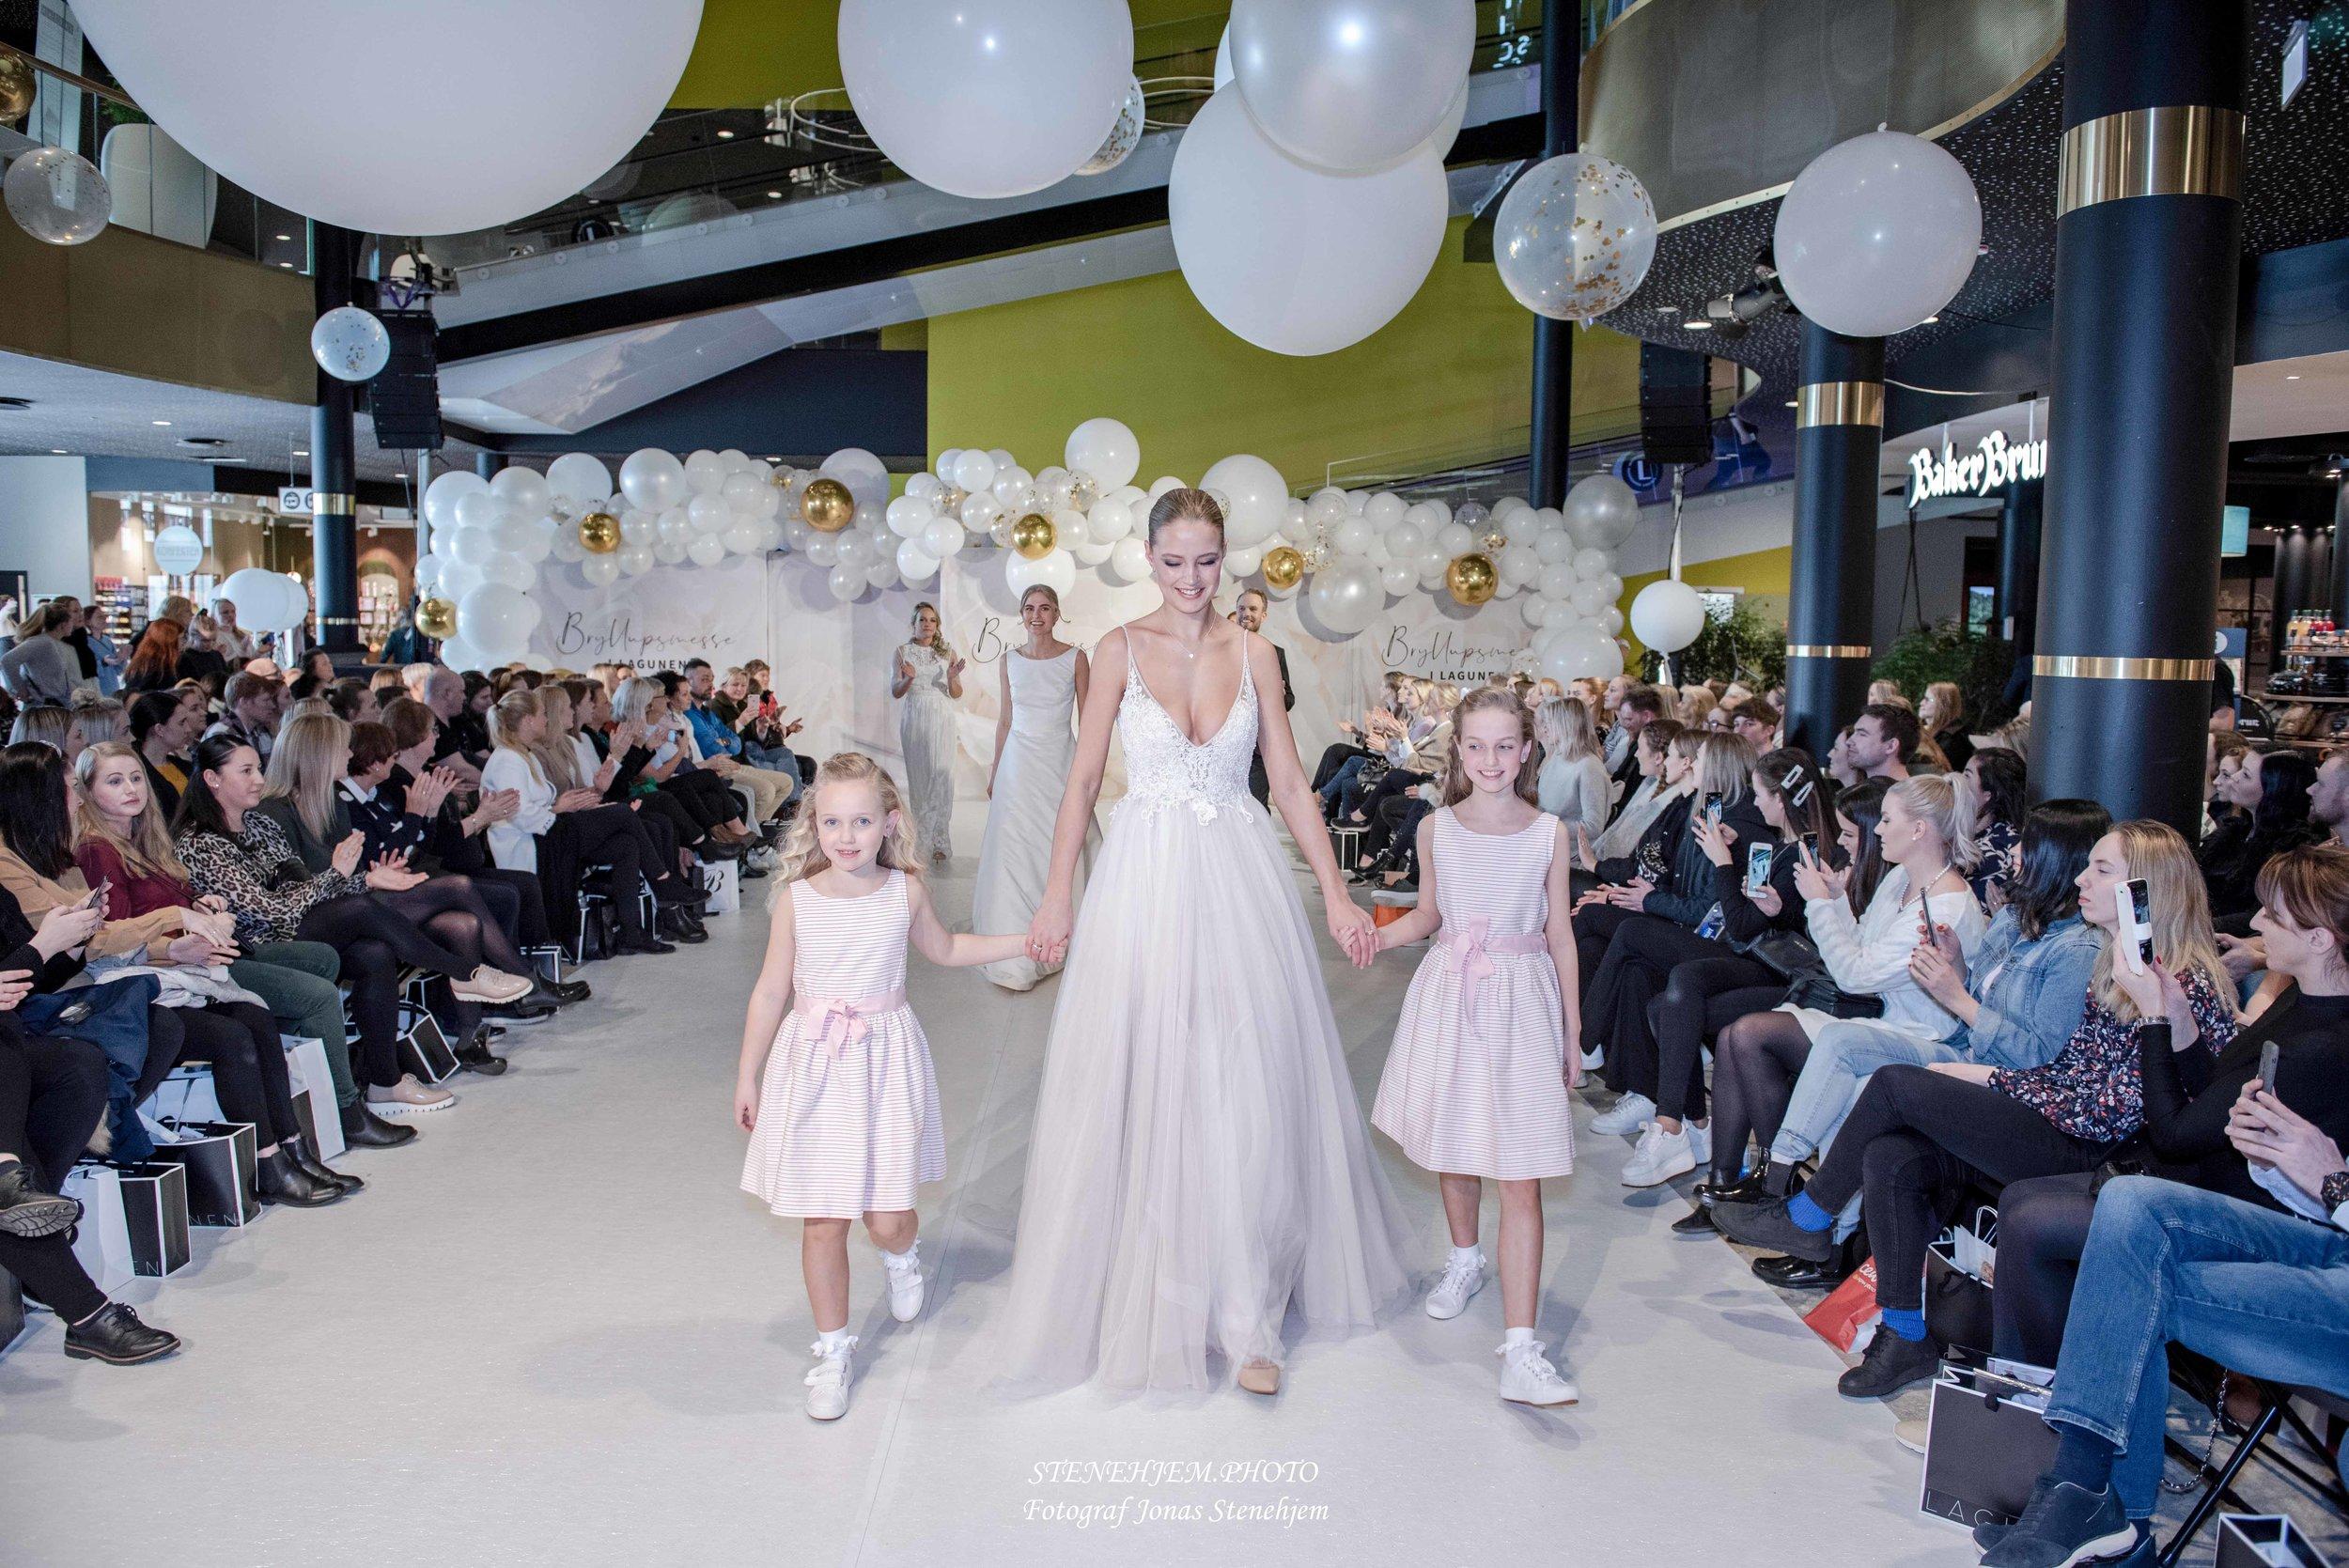 Bryllupsmesse_Lagunen_mittaltweddingfair__093.jpg